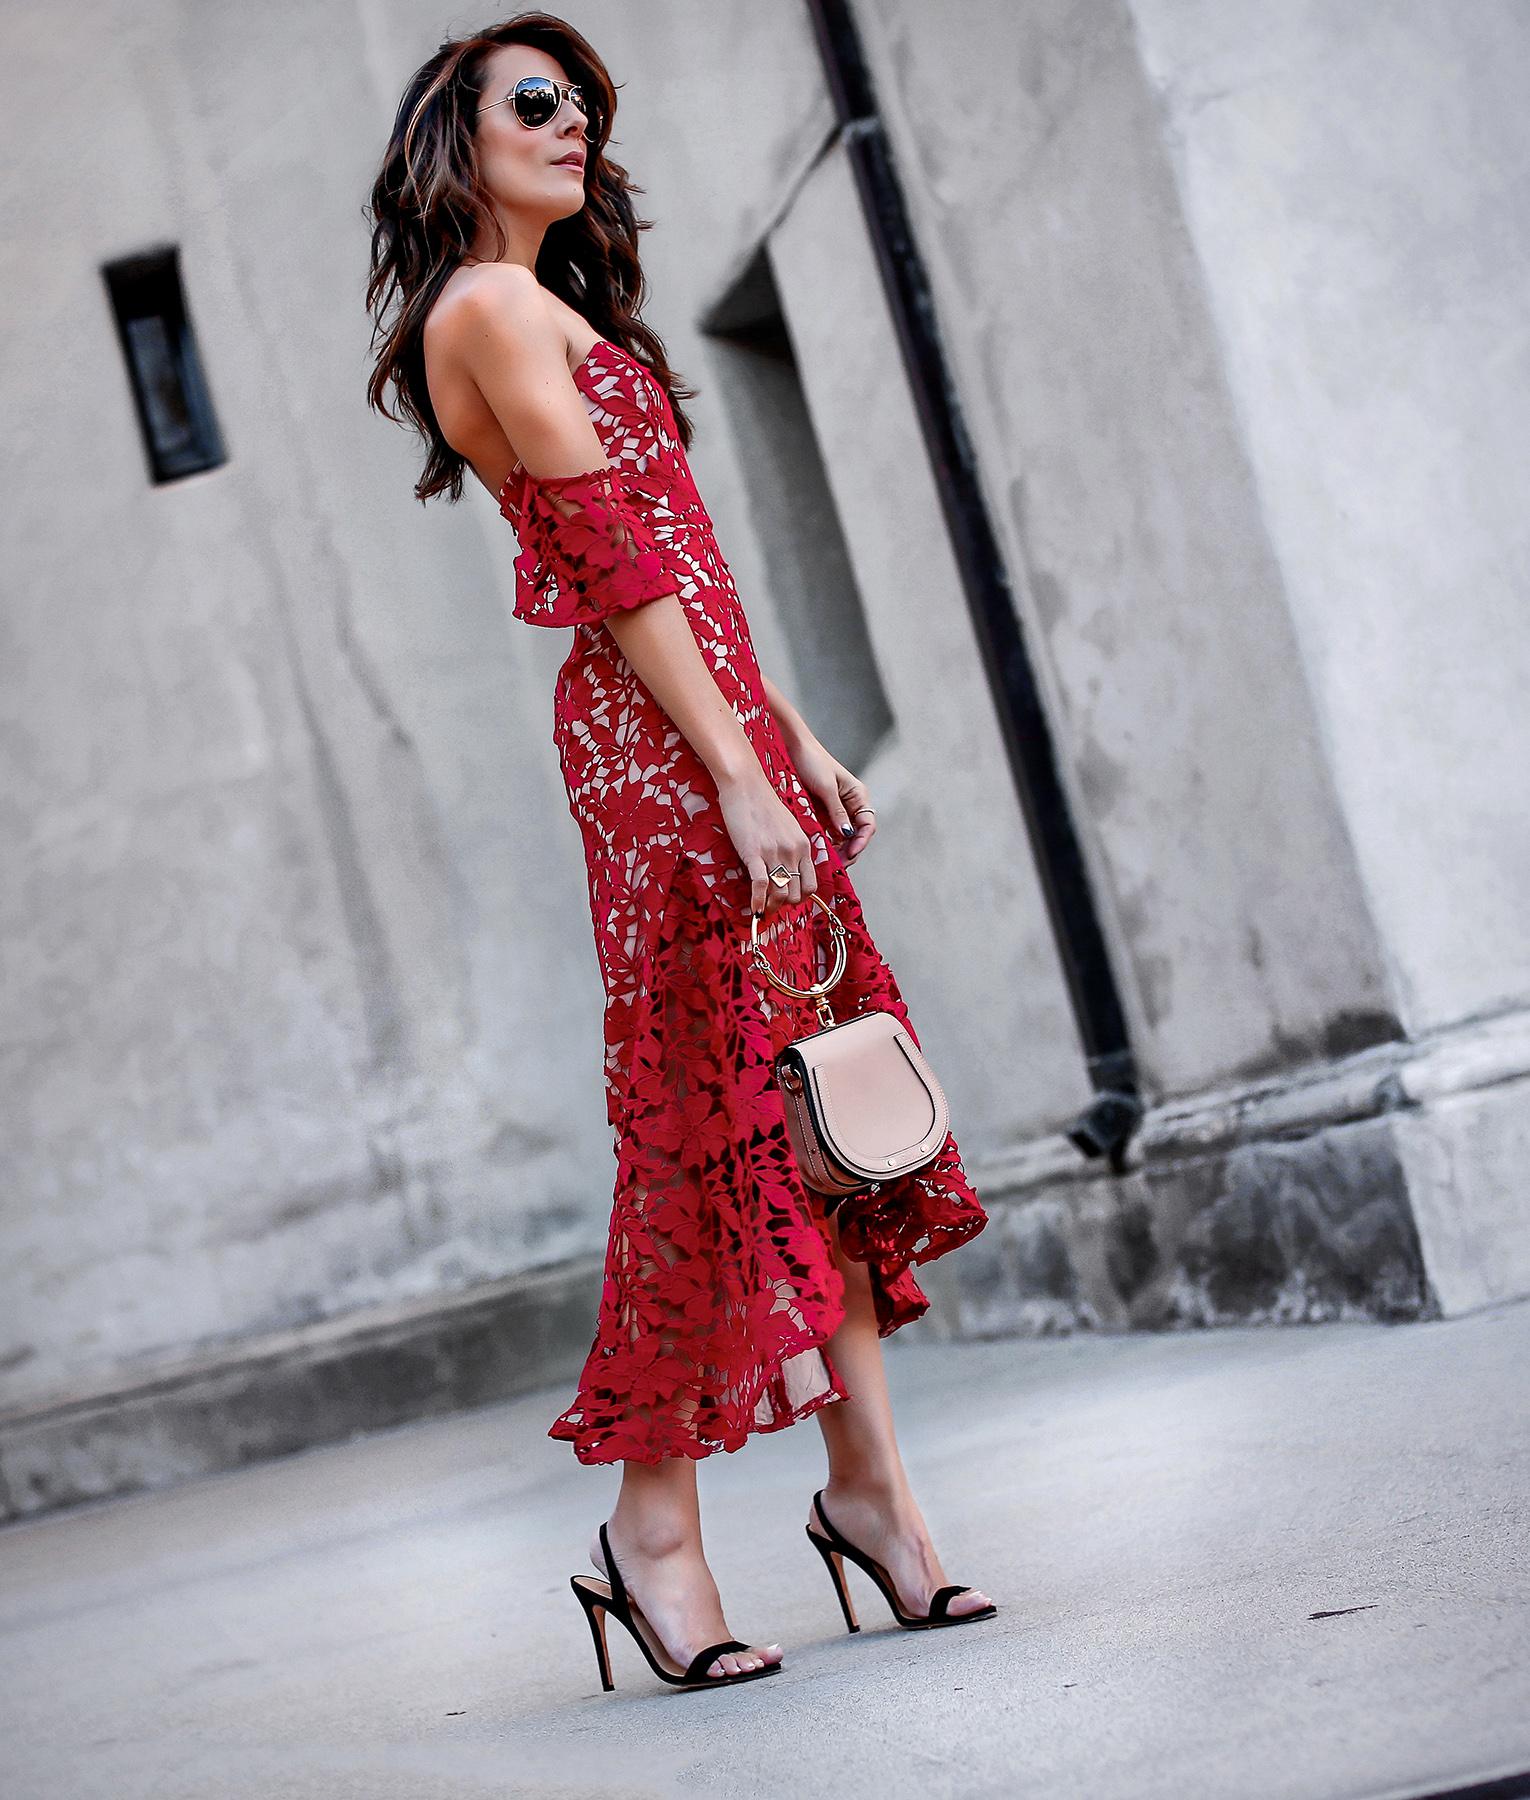 Sau Lee Spring Dress Chloe Nile Bag Easter Dress.jpg